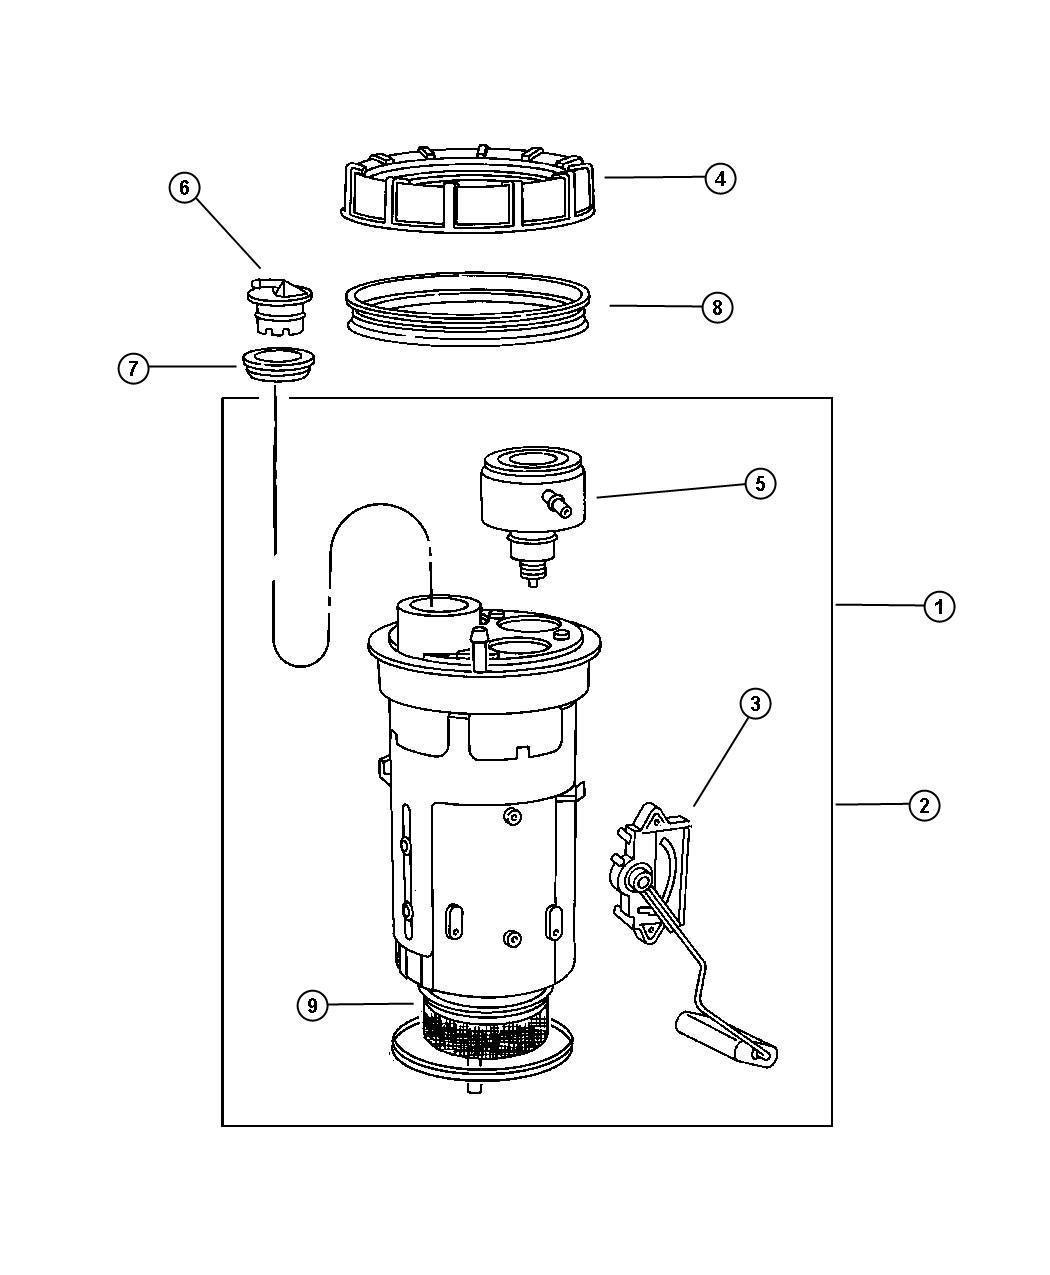 Fuel Sending Unit Diagram